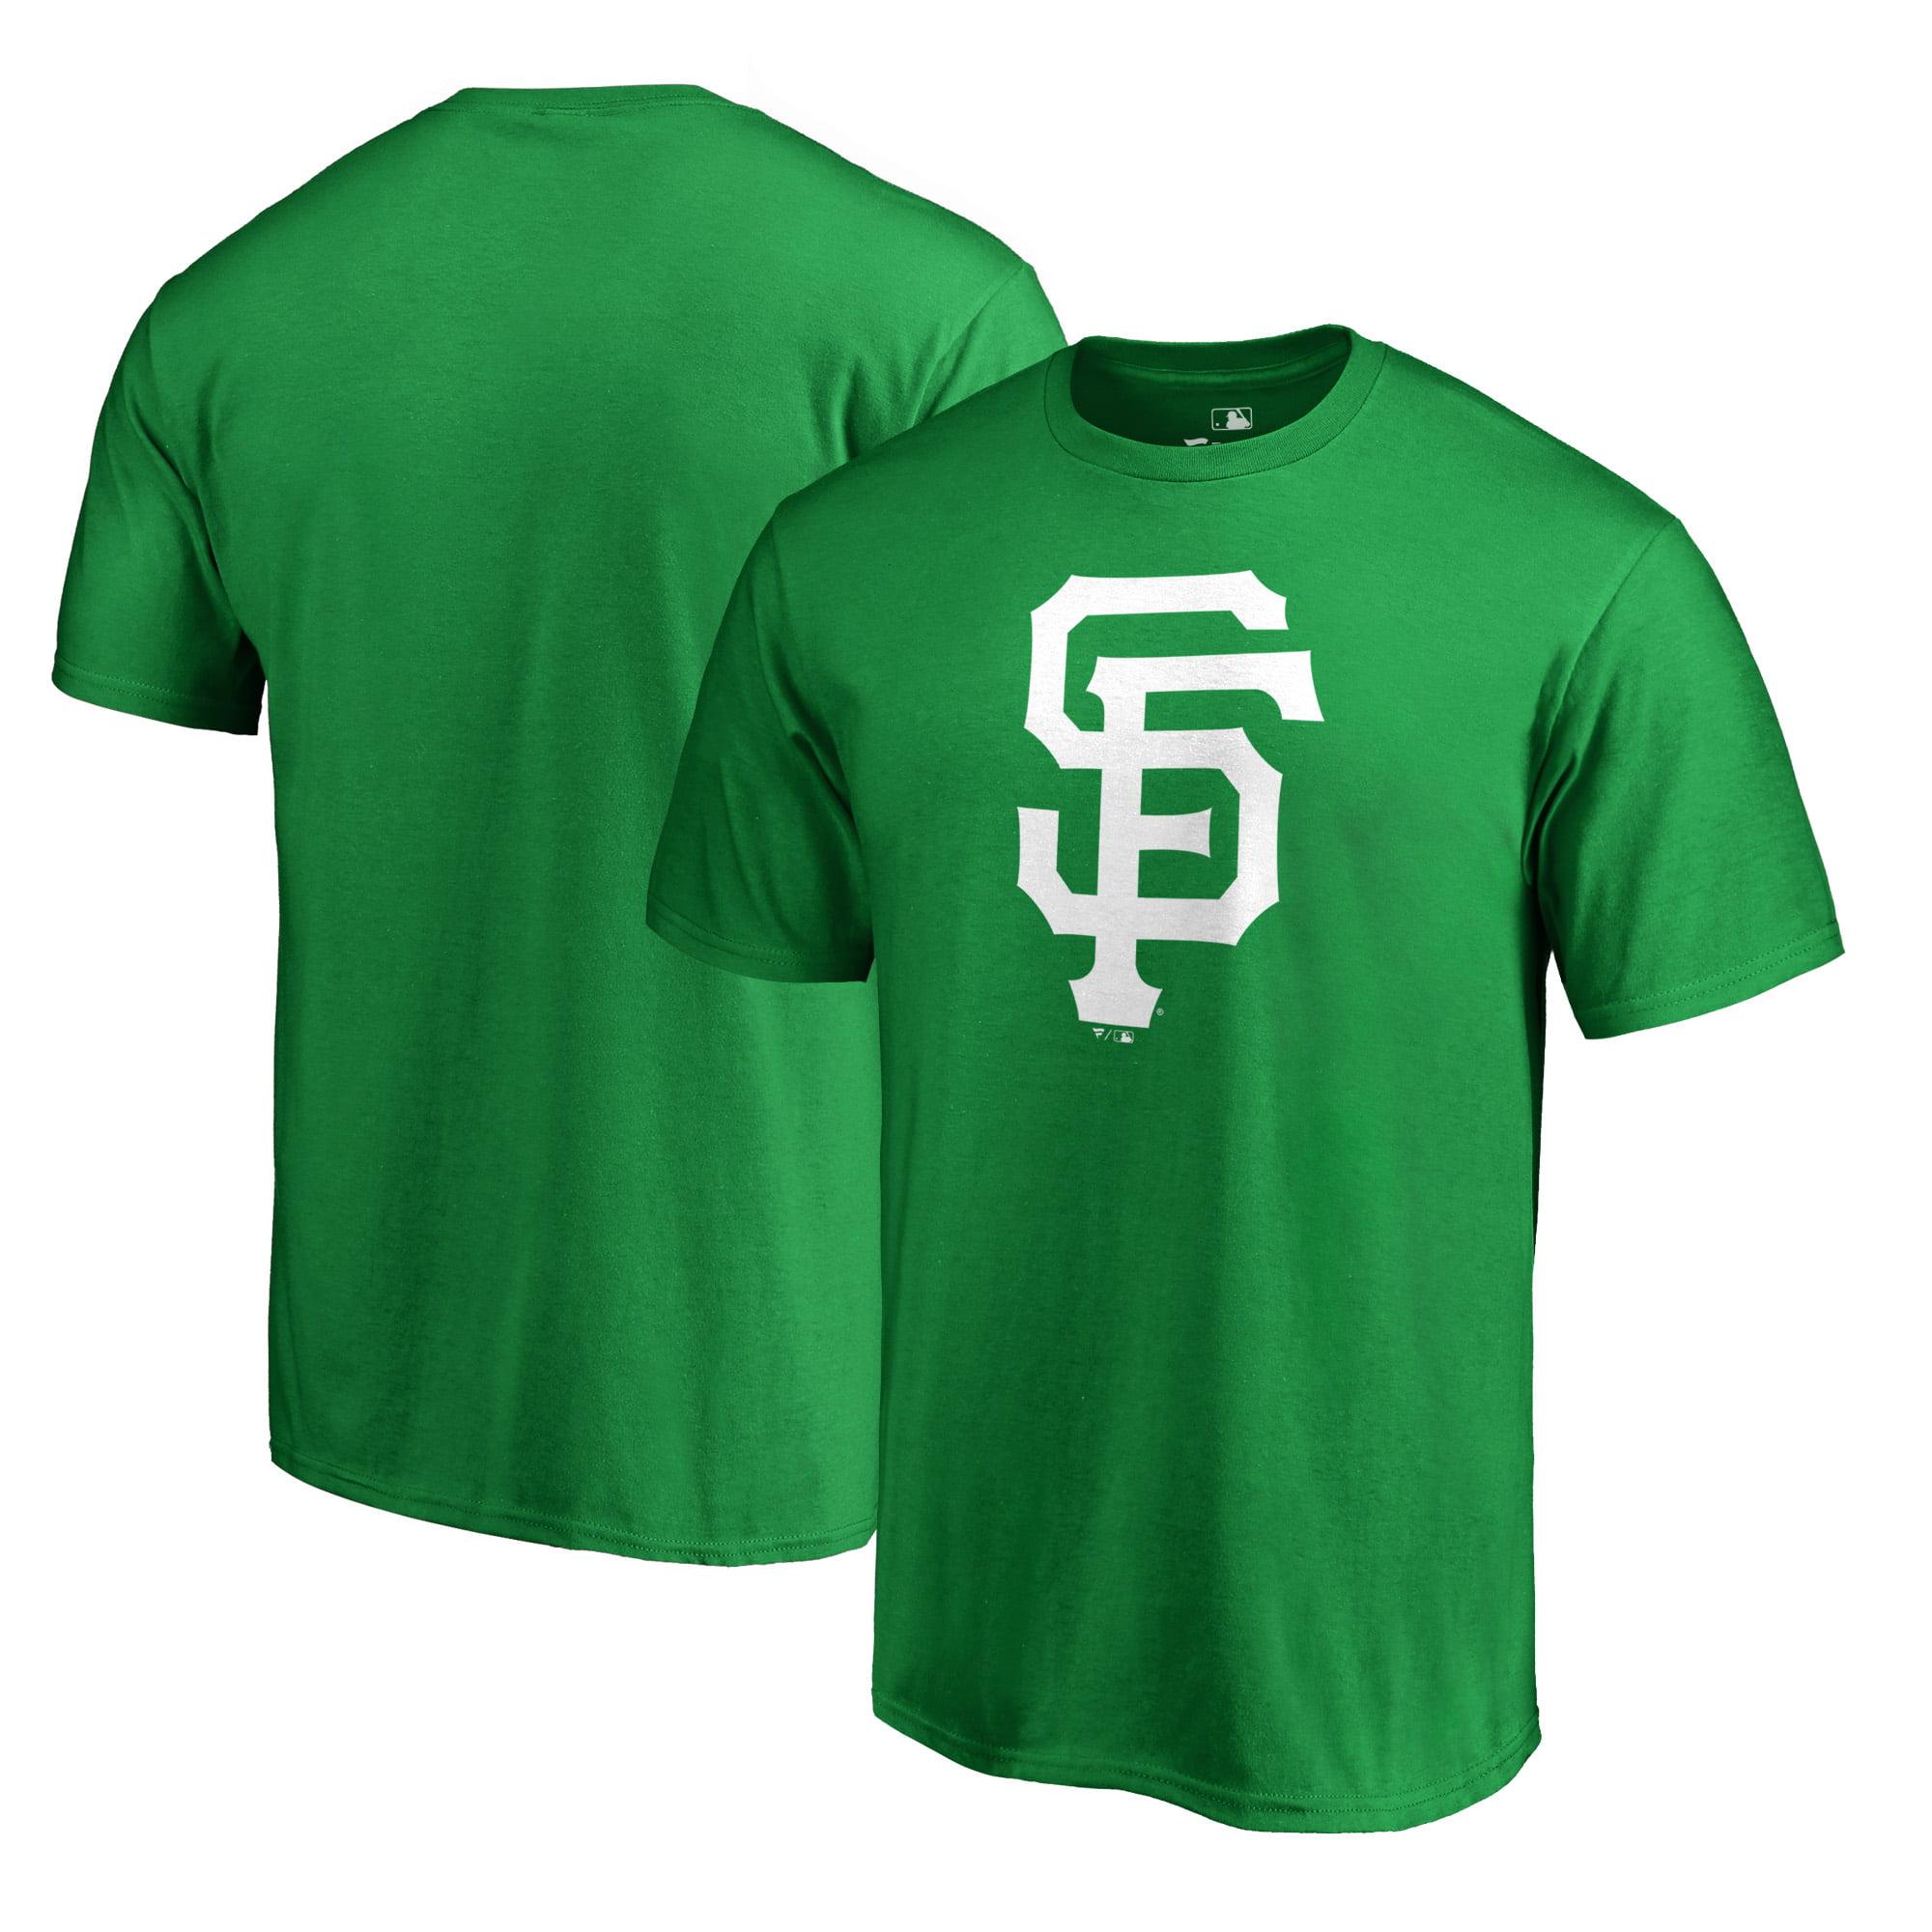 San Francisco Giants Fanatics Branded St. Patrick's Day White Logo Big & Tall T-Shirt - Green